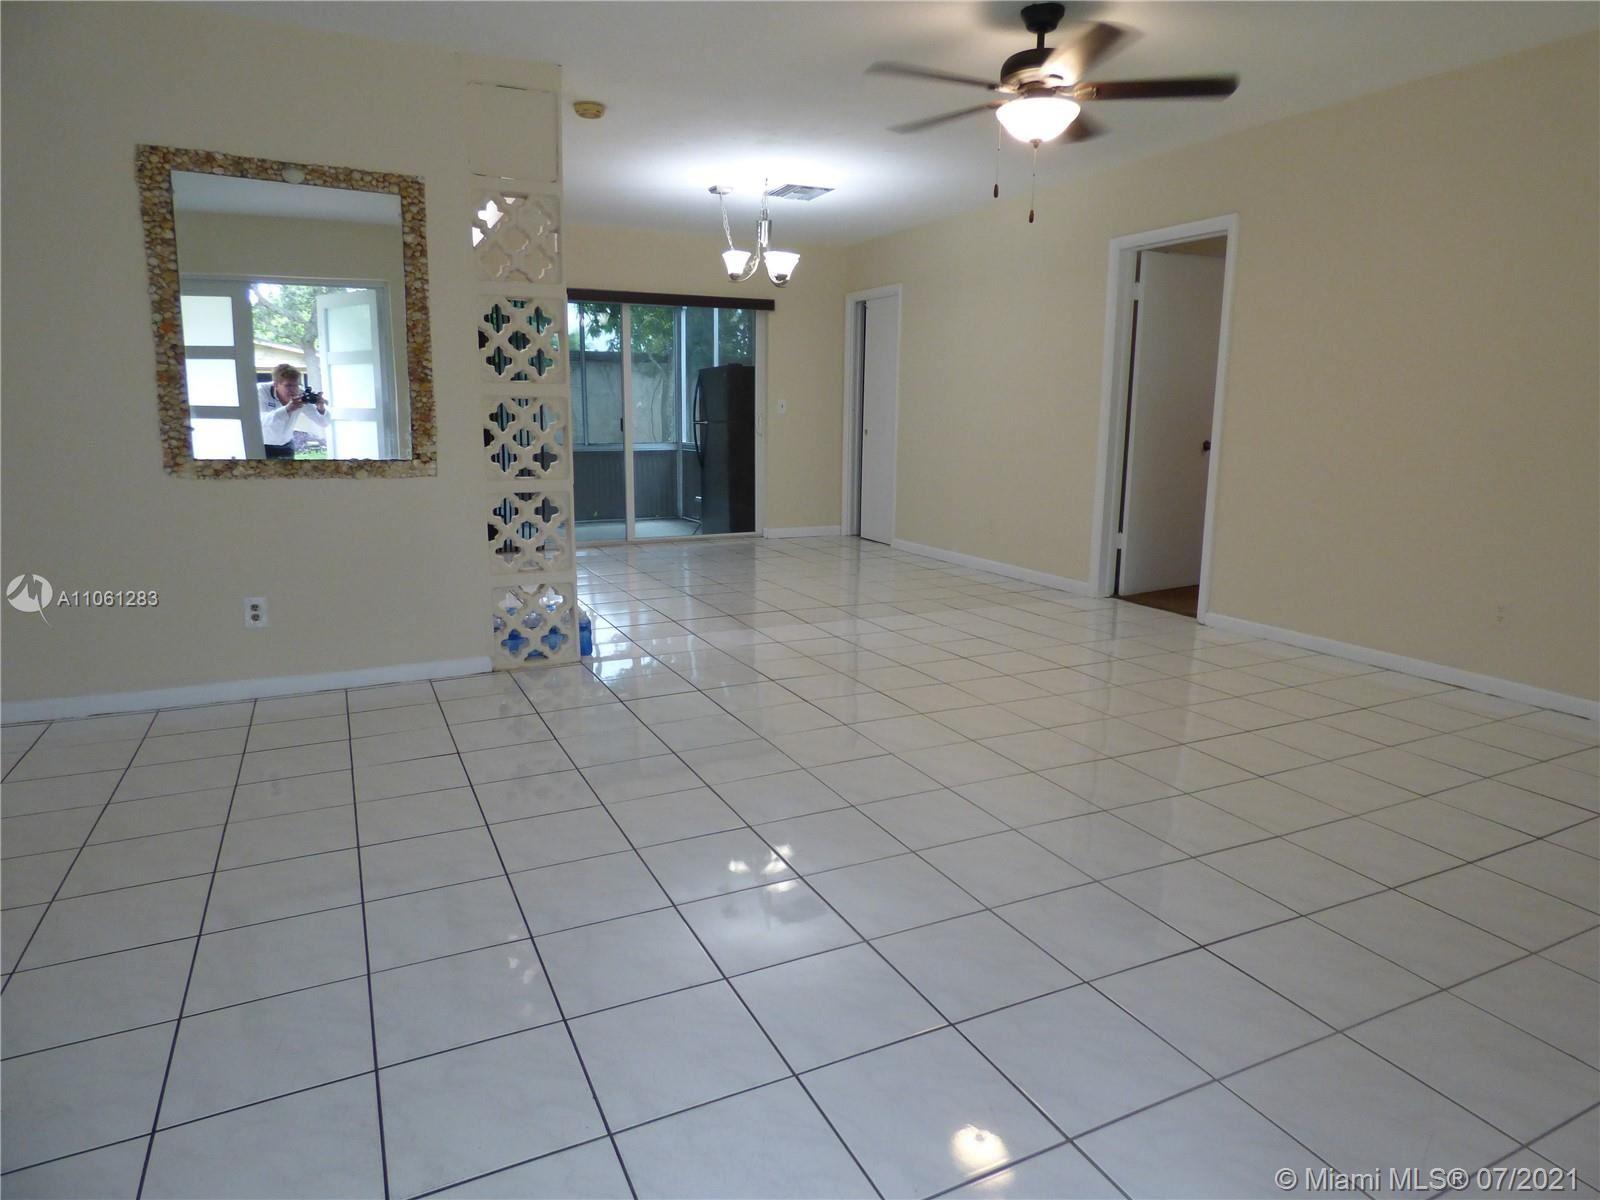 Photo of 830 NE 182nd St, North Miami Beach, FL 33162 (MLS # A11061283)